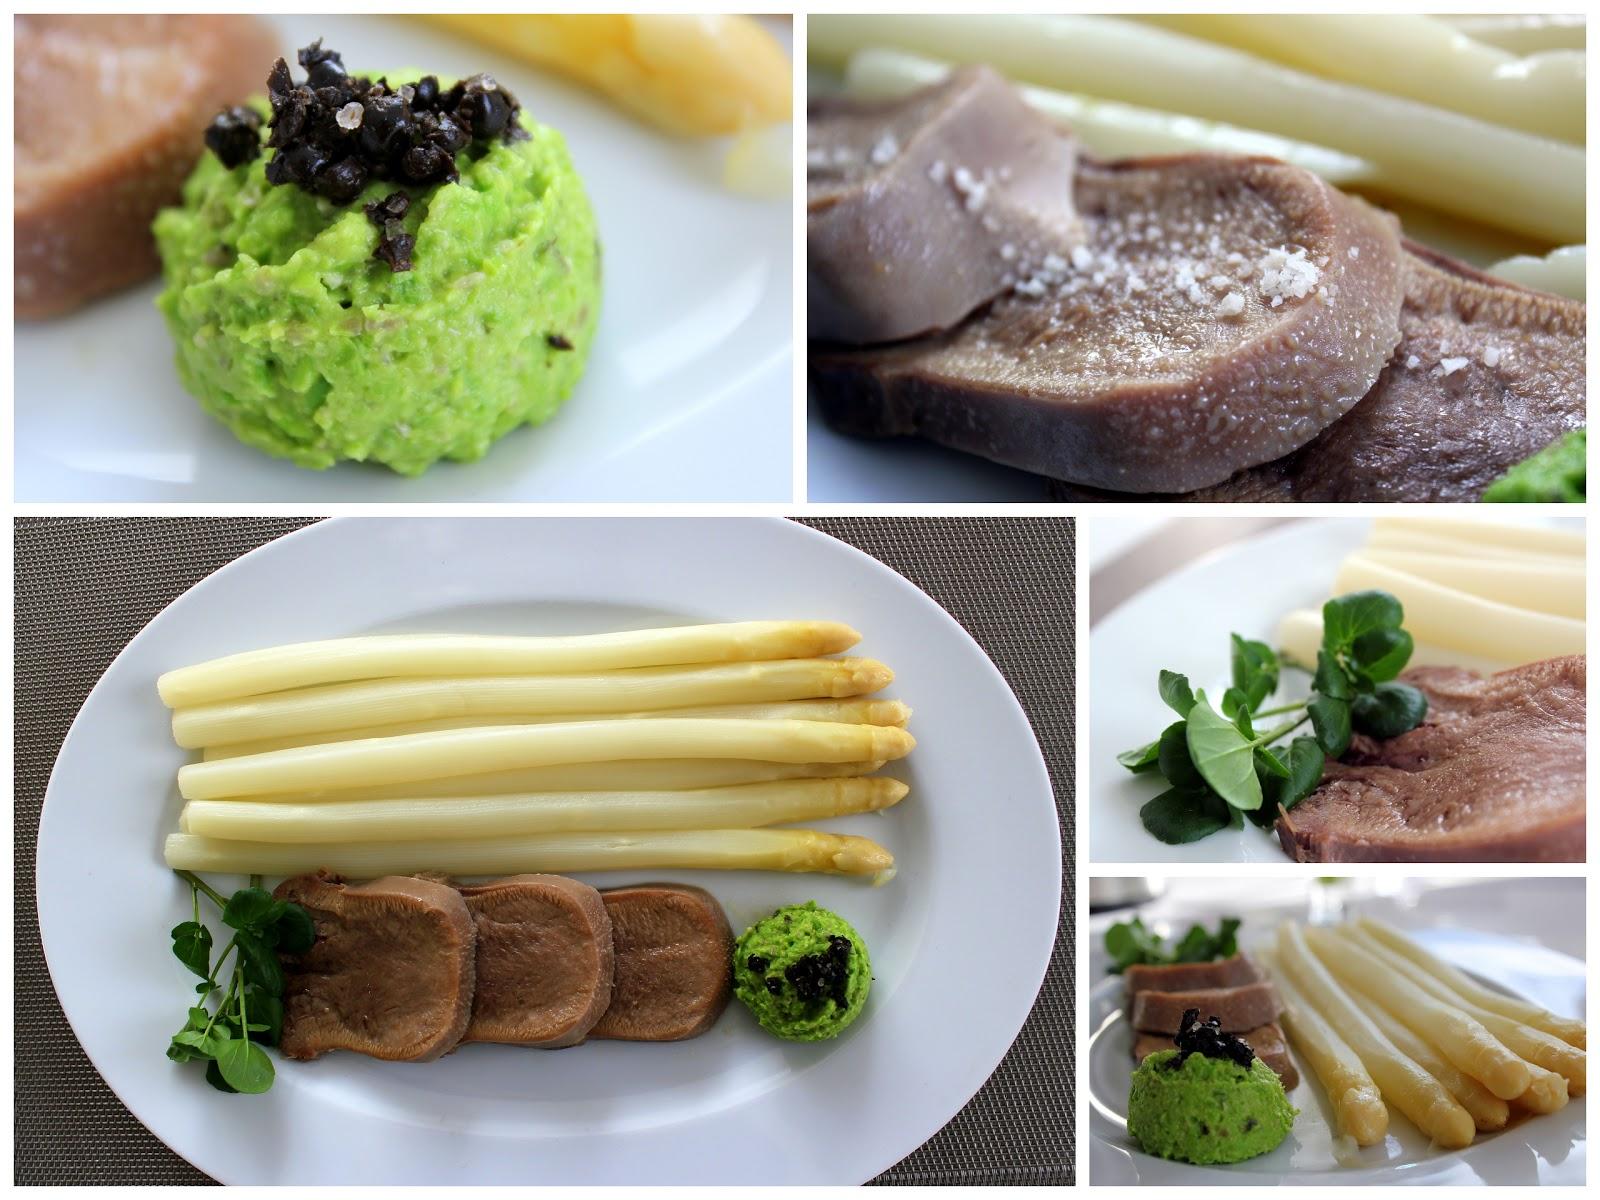 Kalbszunge mit Spargel, Erbsenpesto, fermentierter schwarzer Hochlandpfeffer | Arthurs Tochter Kocht by Astrid Paul